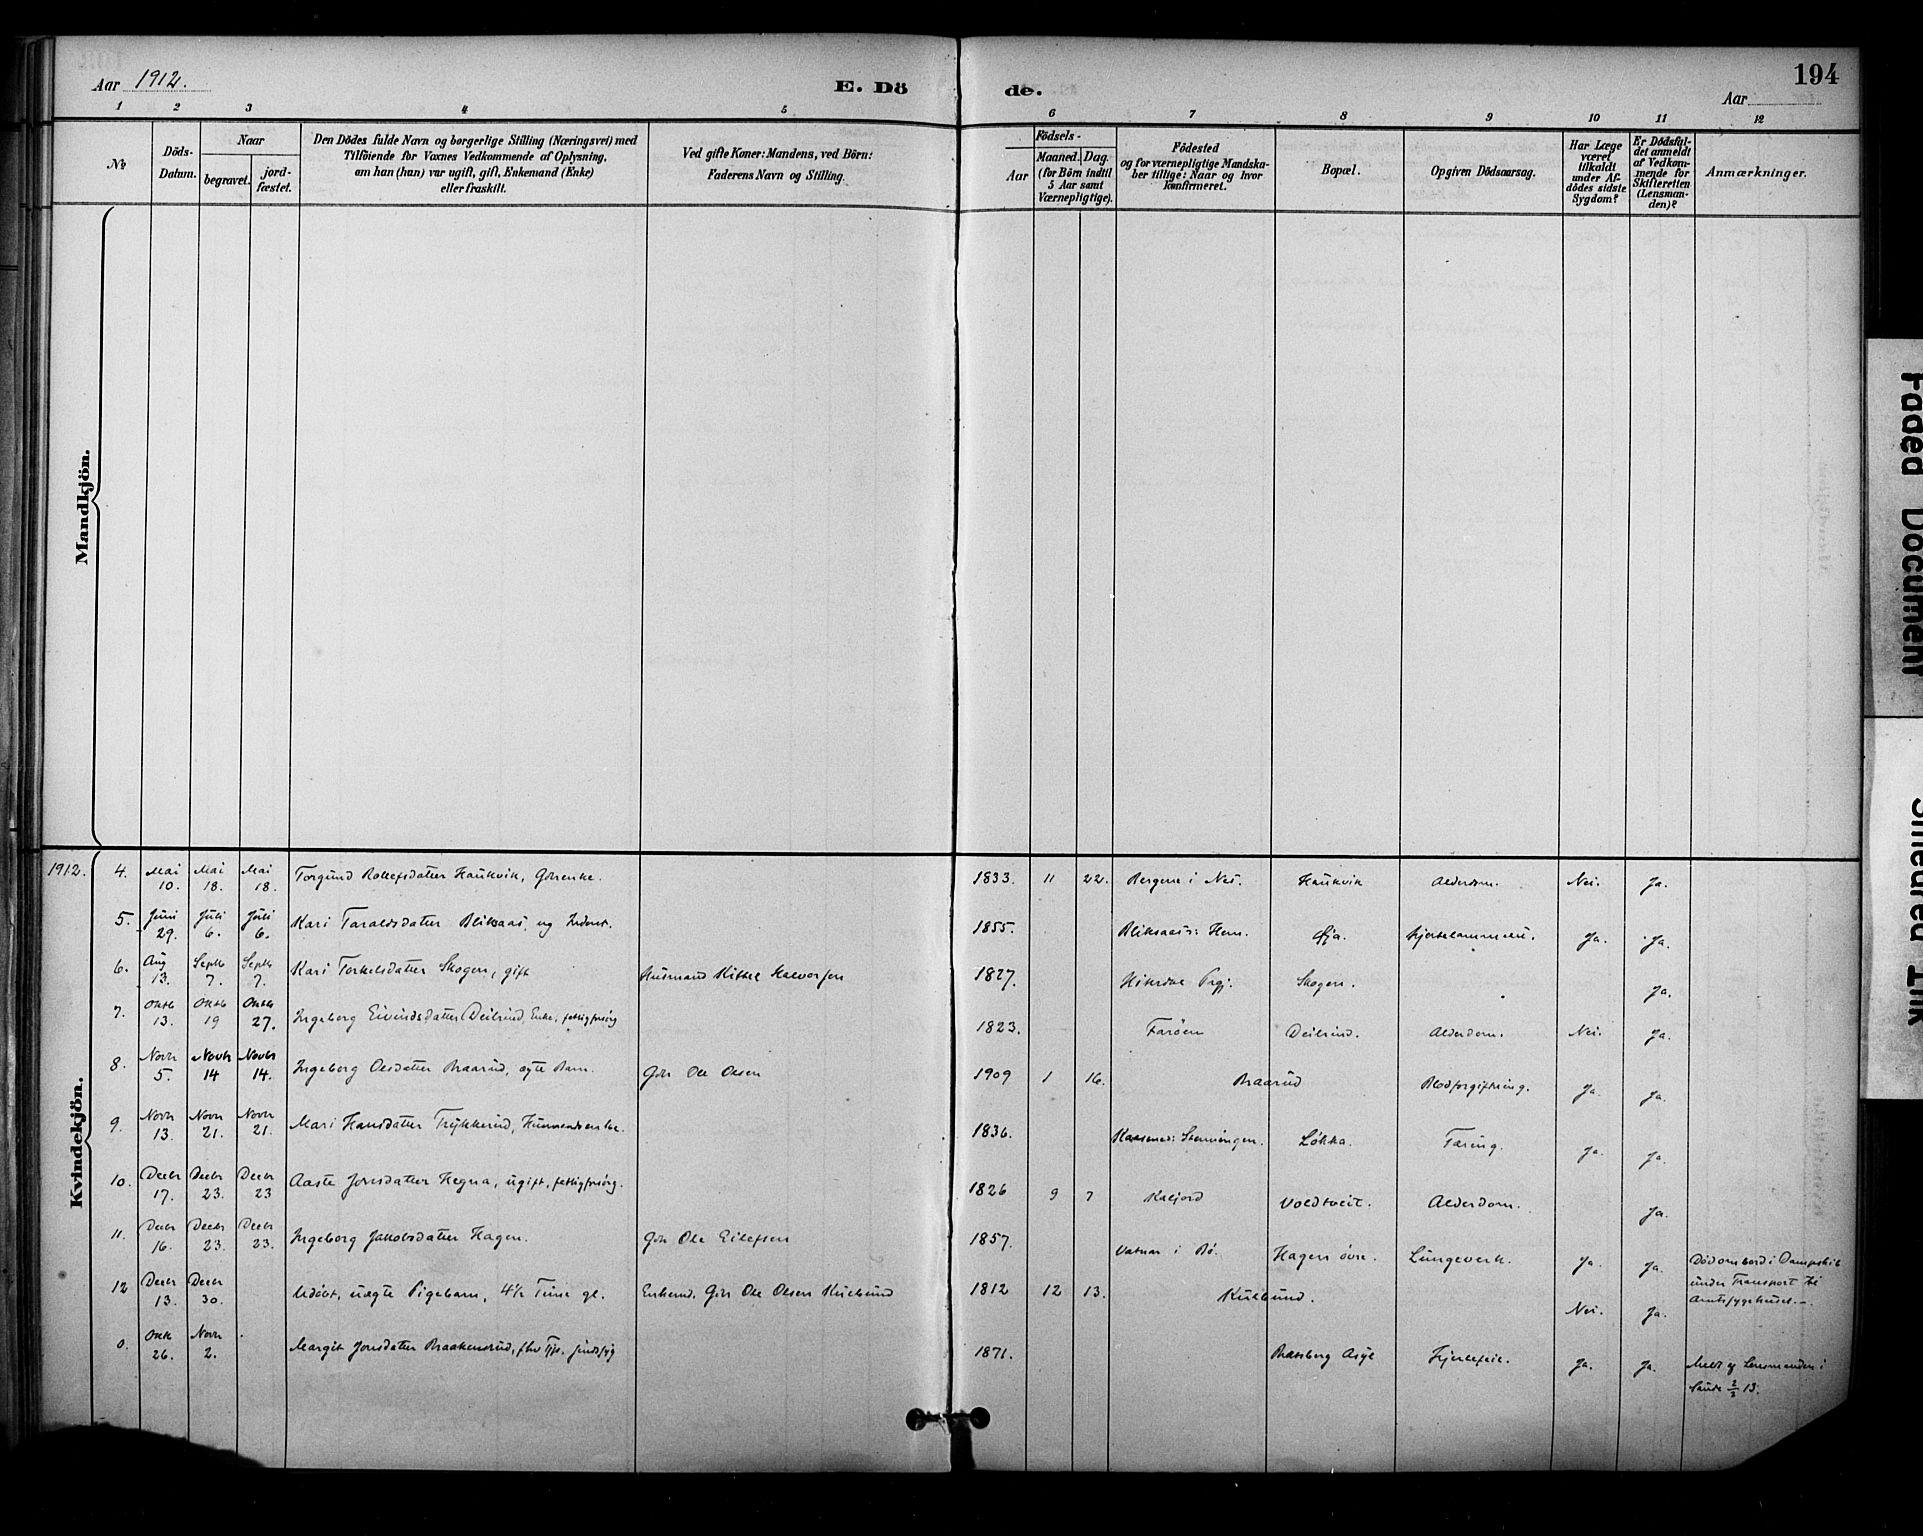 SAKO, Sauherad kirkebøker, F/Fa/L0009: Ministerialbok nr. I 9, 1887-1912, s. 194